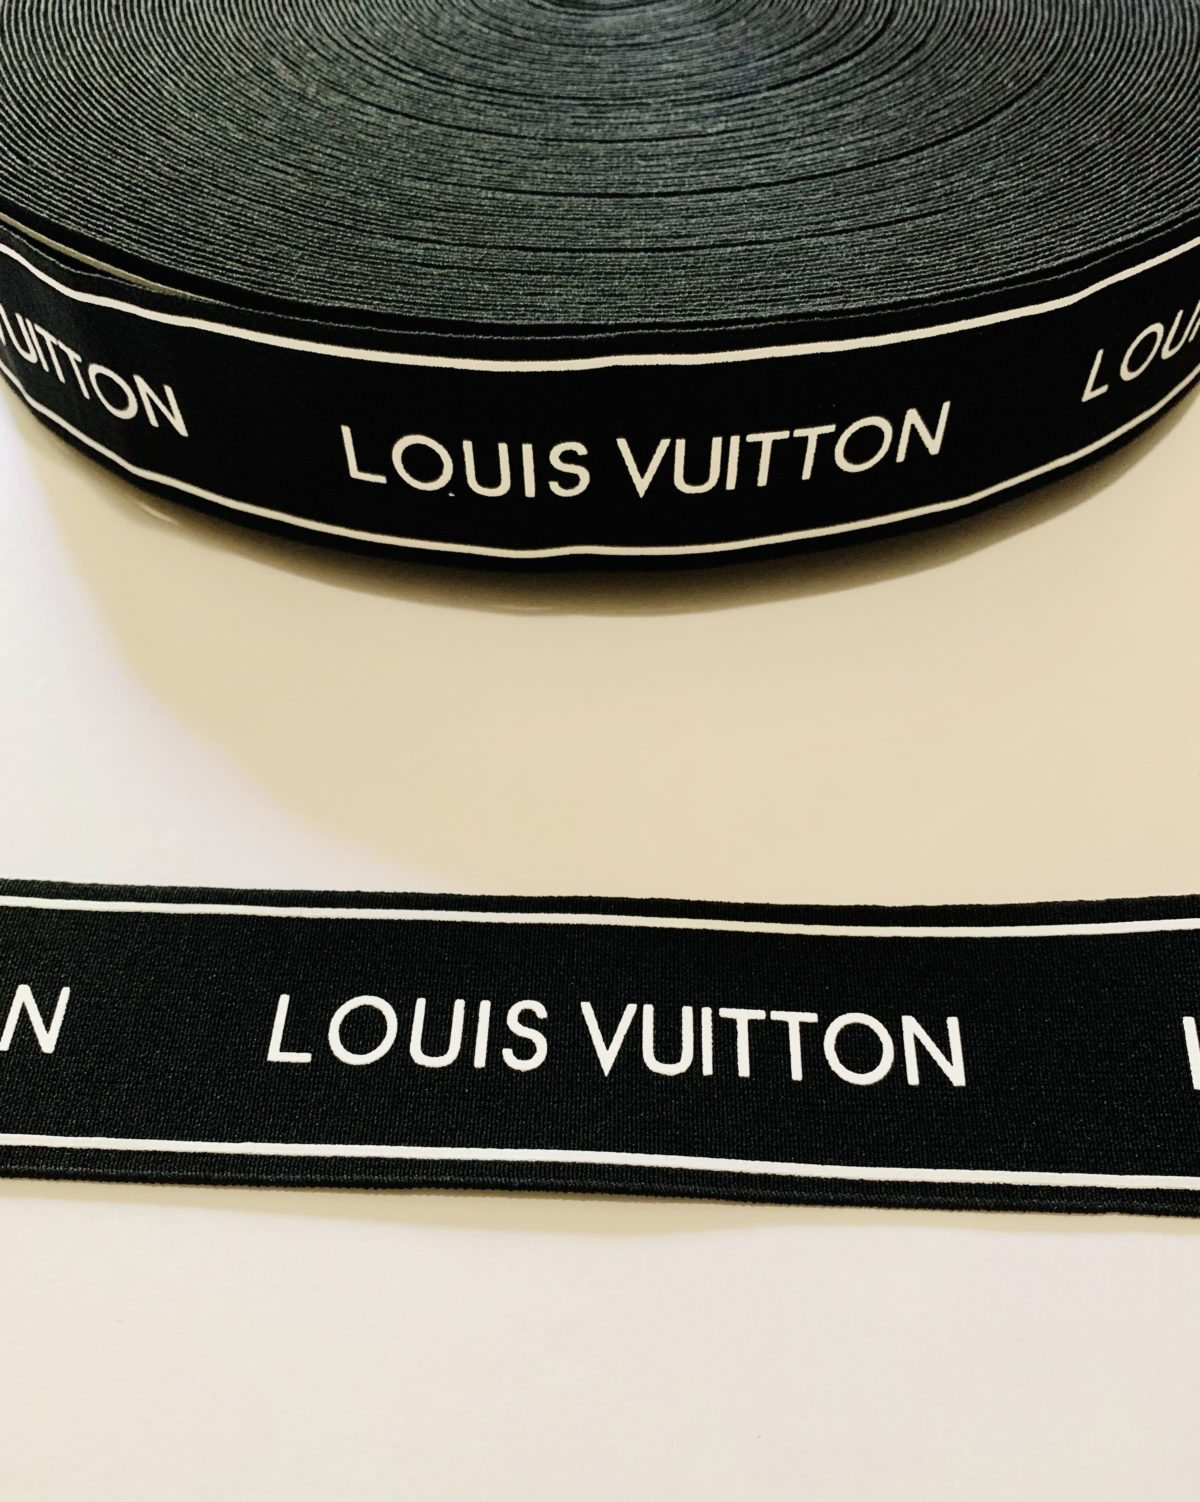 NEW Louis Vuitton Inspired Elastic Trim,  LV Waistband 4cm 2